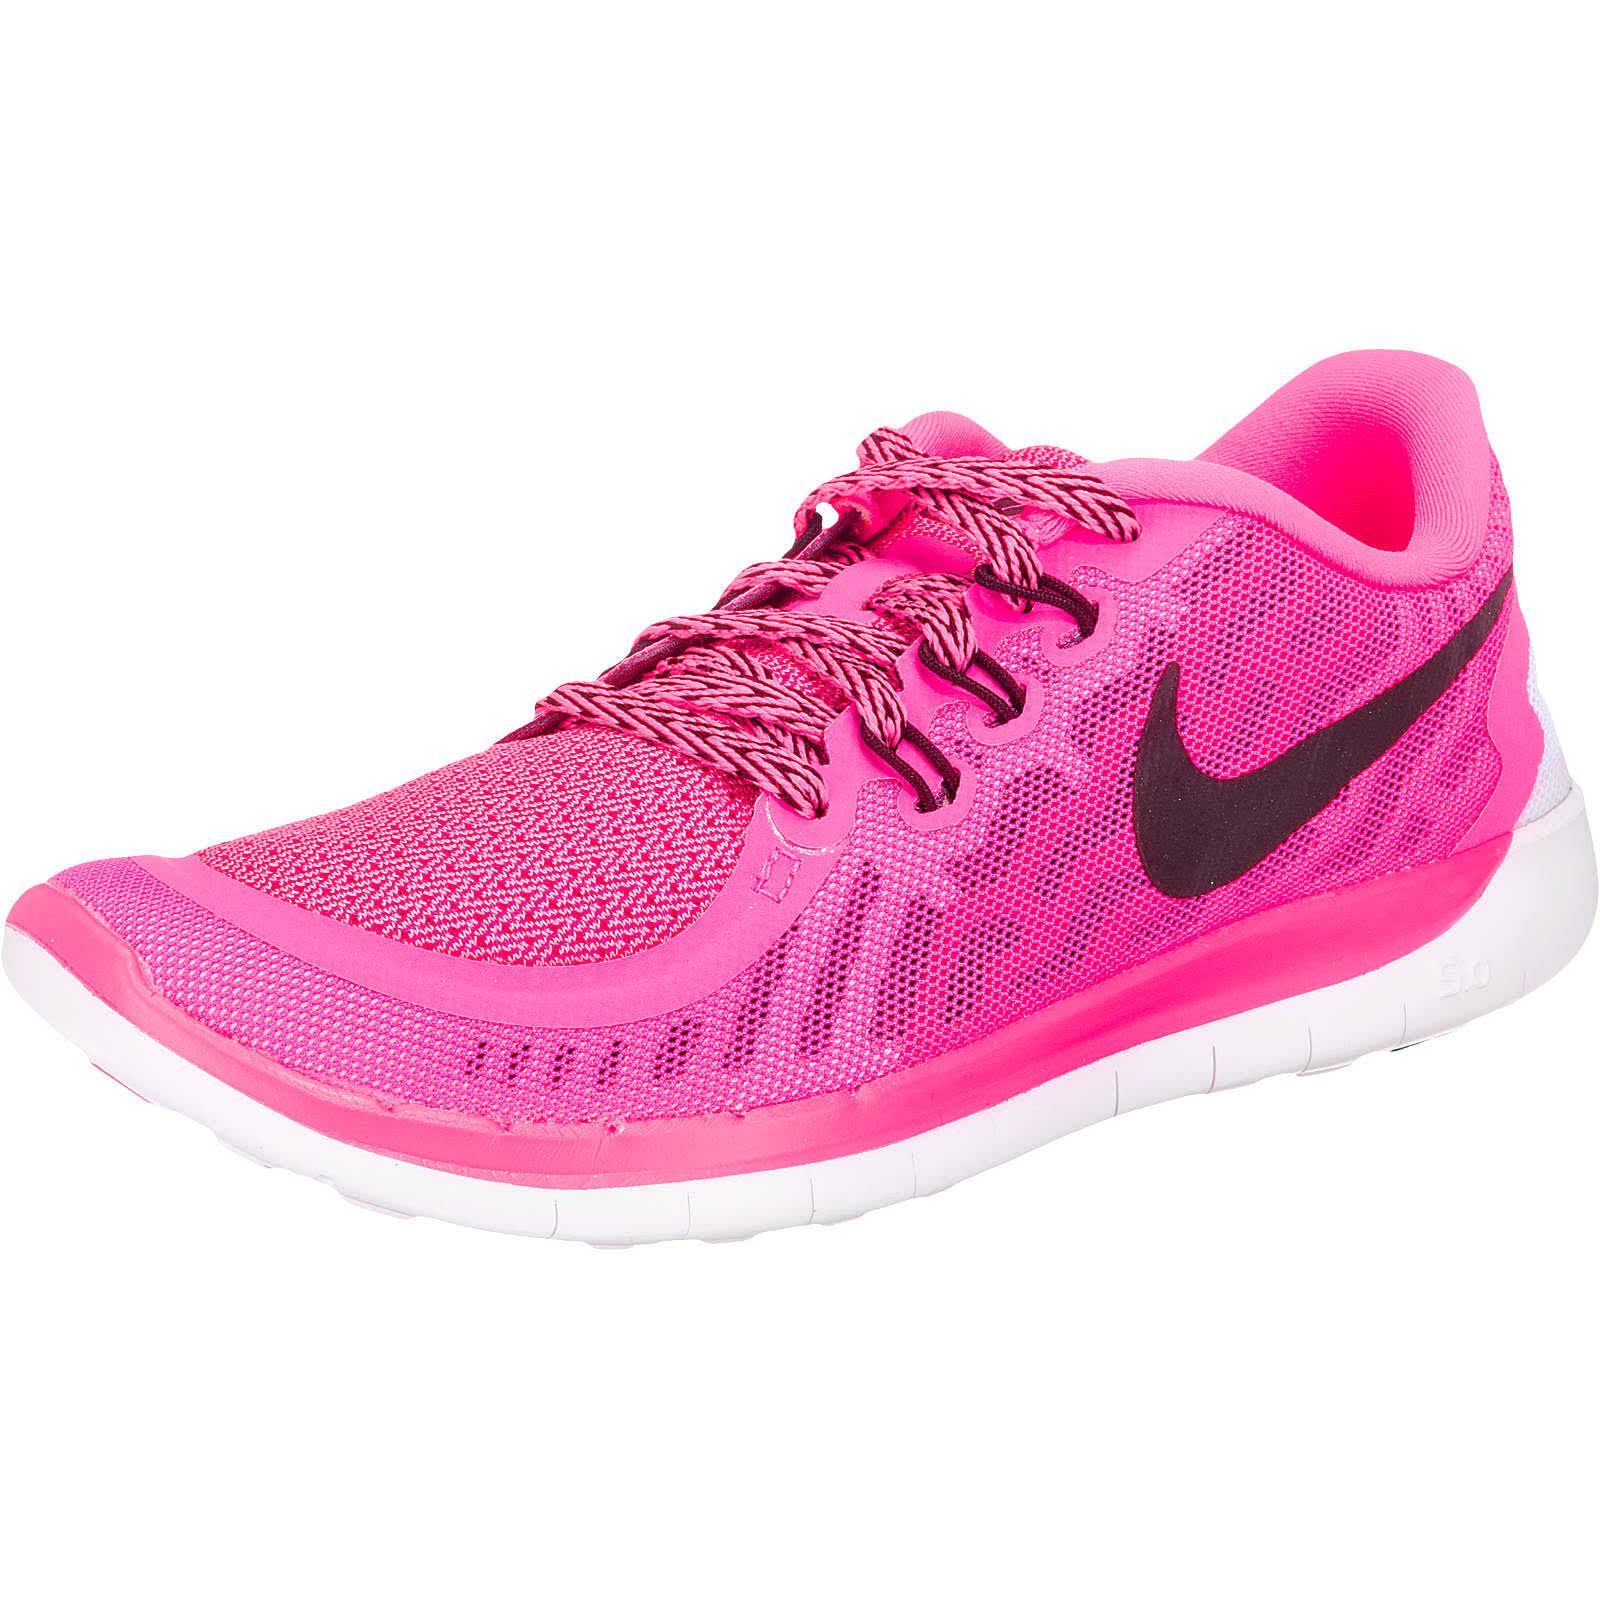 Nike Rose 5 3 5 pink Kinder 0 Laufschuhe rosa Gs Free rvxB6w5qr